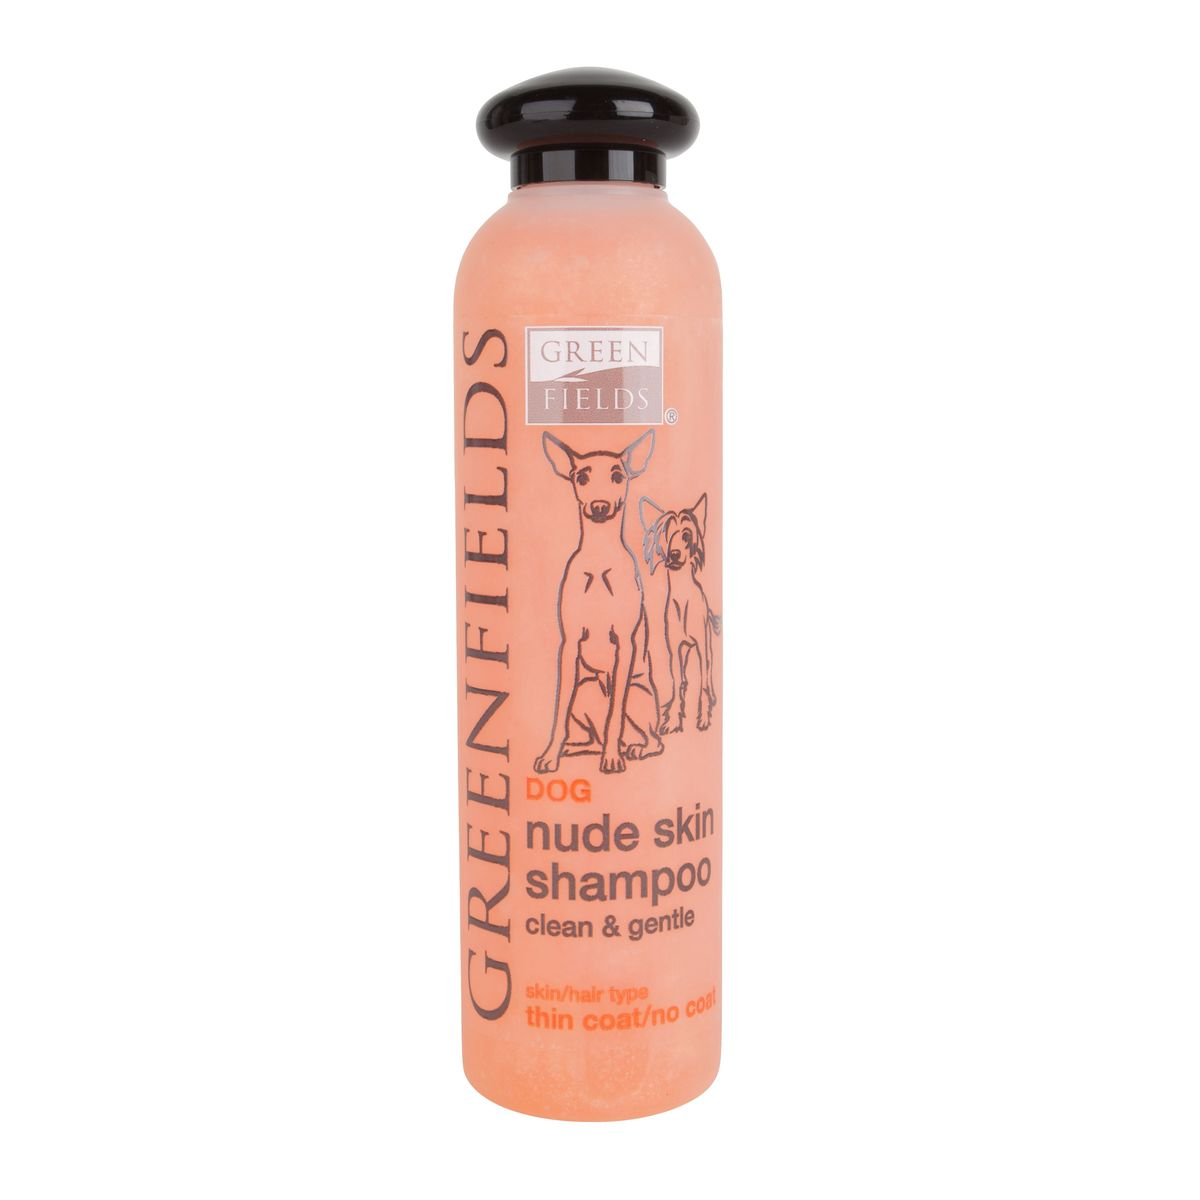 Greenfields Dog Nude Skin Shampoo